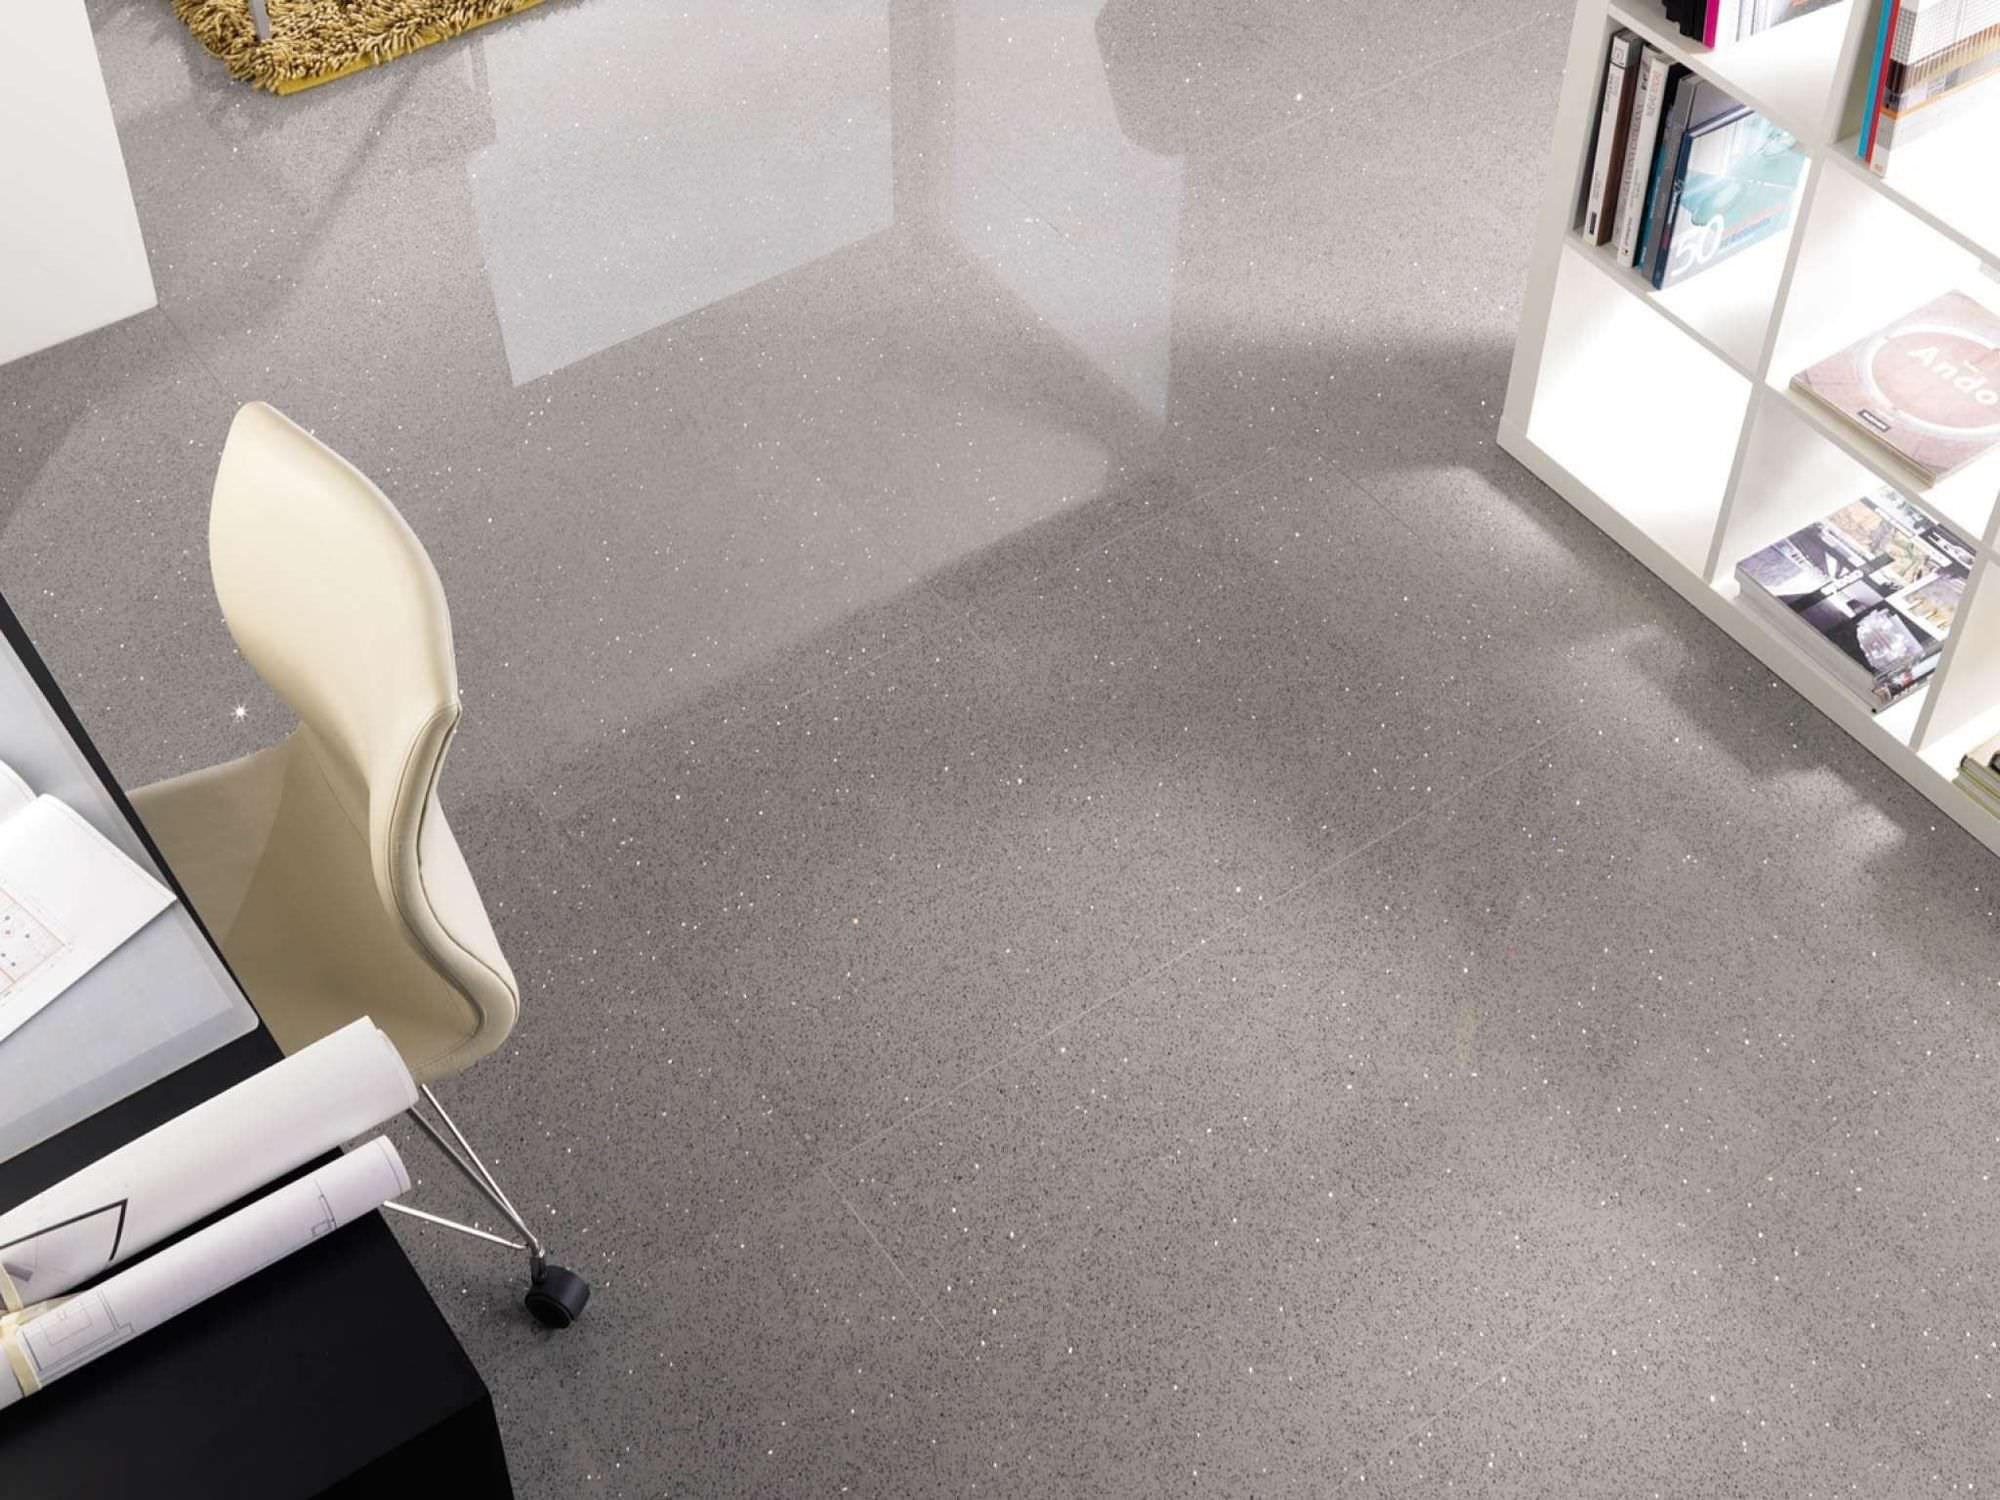 Floor tile / engineered stone / matte DQS (DESIGN QUARTZ STONE) L'ANTIC COLONIAL by Porcelanosa